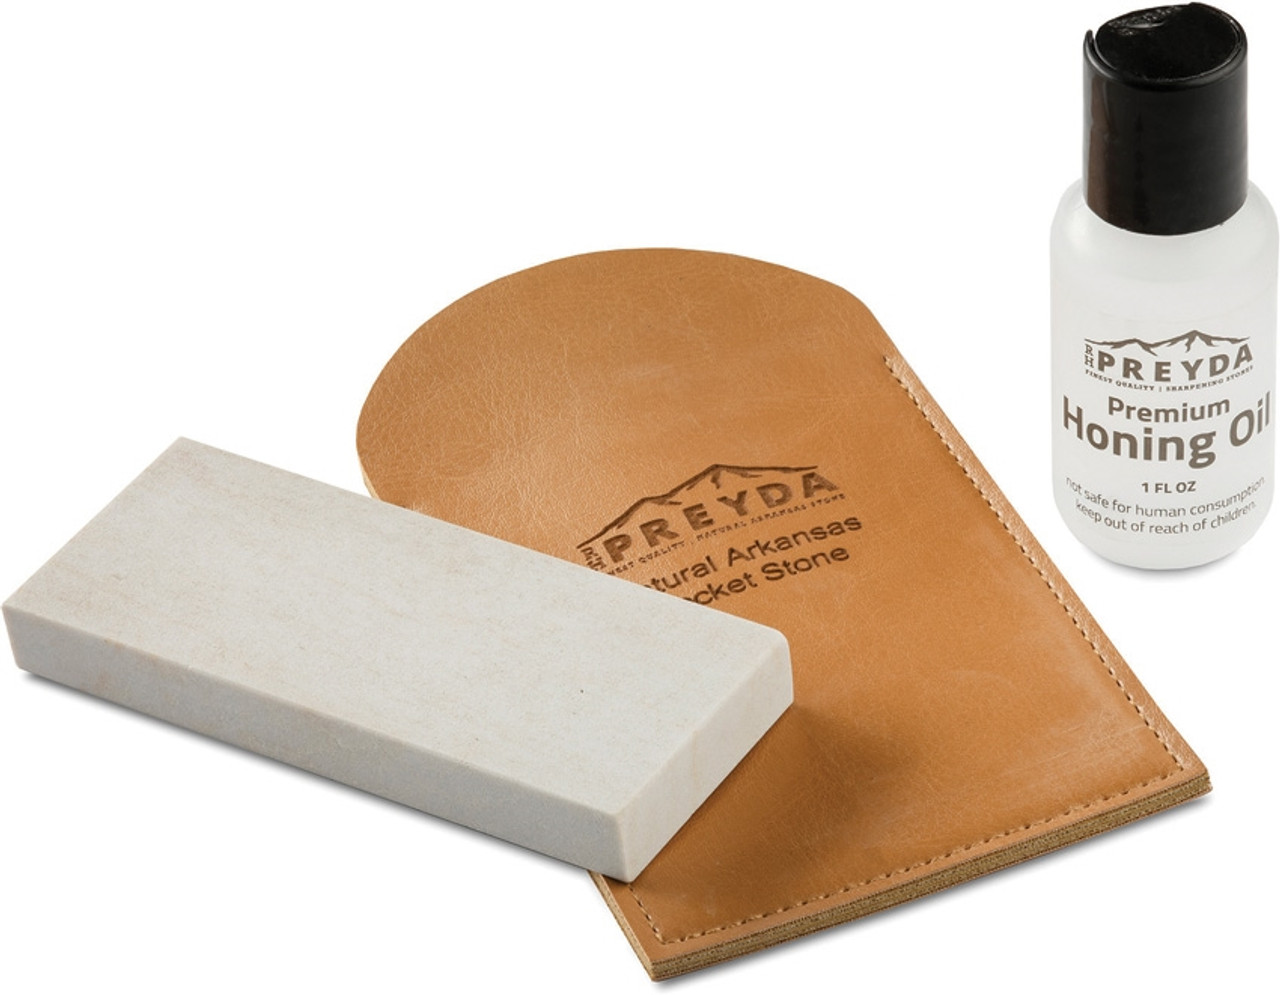 RH Preyda Arkansas Stone Pocket 30497, Brown Leather Sleeve and Honing Oil